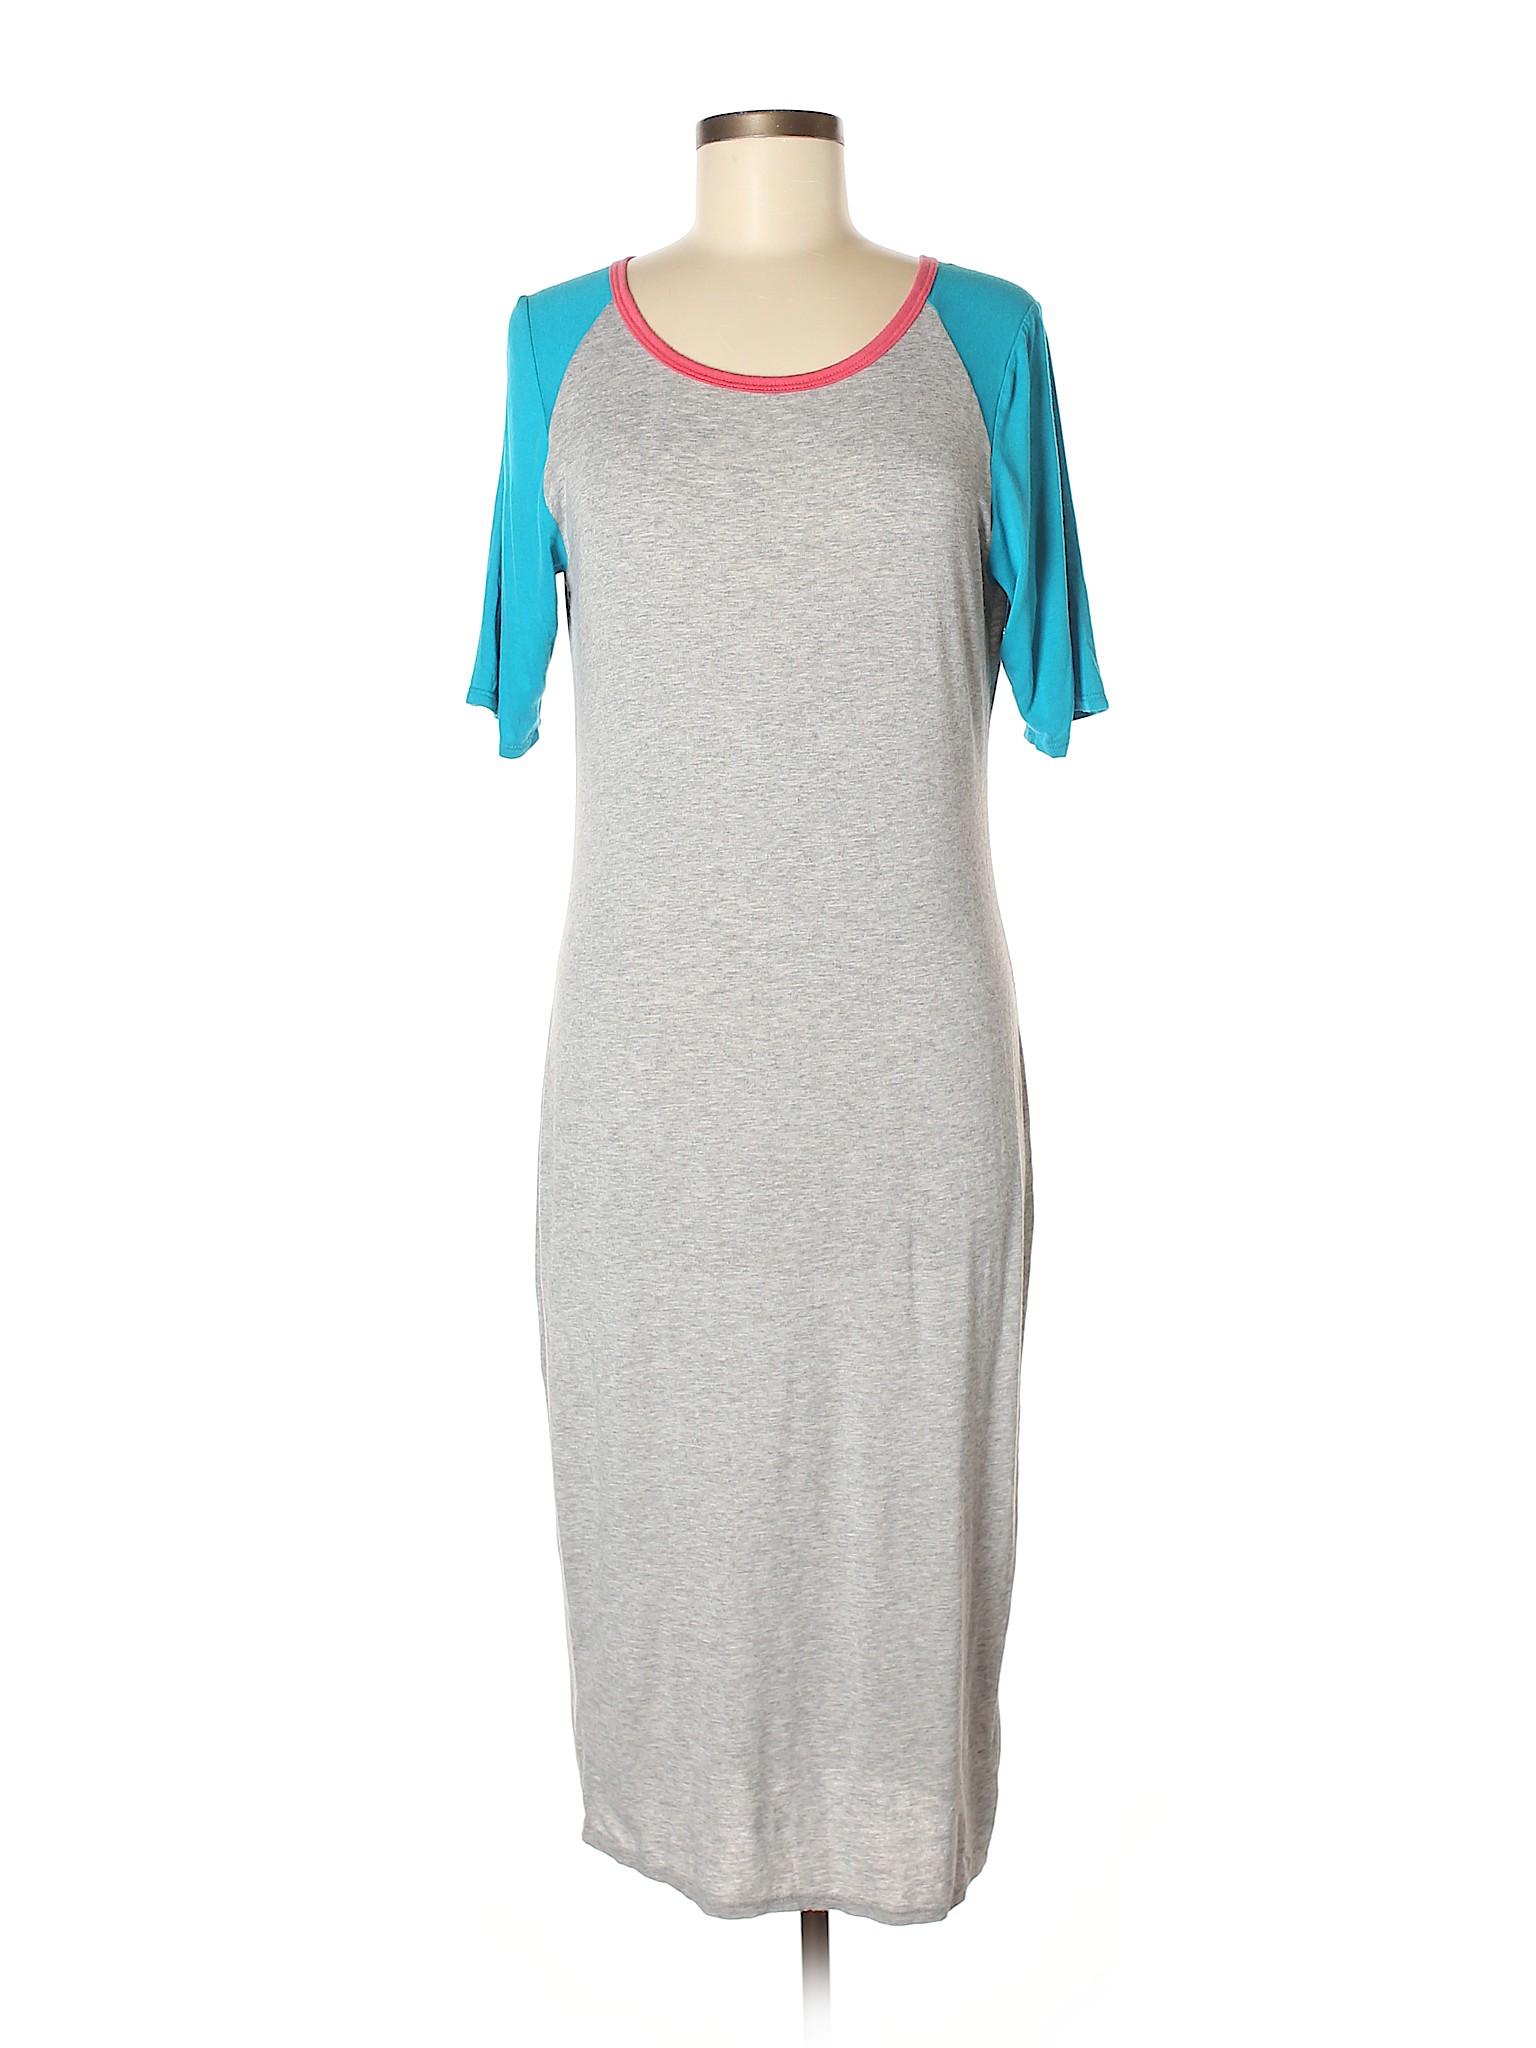 Casual Casual Dress Lularoe Casual Selling Lularoe Dress Lularoe Casual Dress Selling Selling Lularoe Selling Dress Selling xqxfTP14